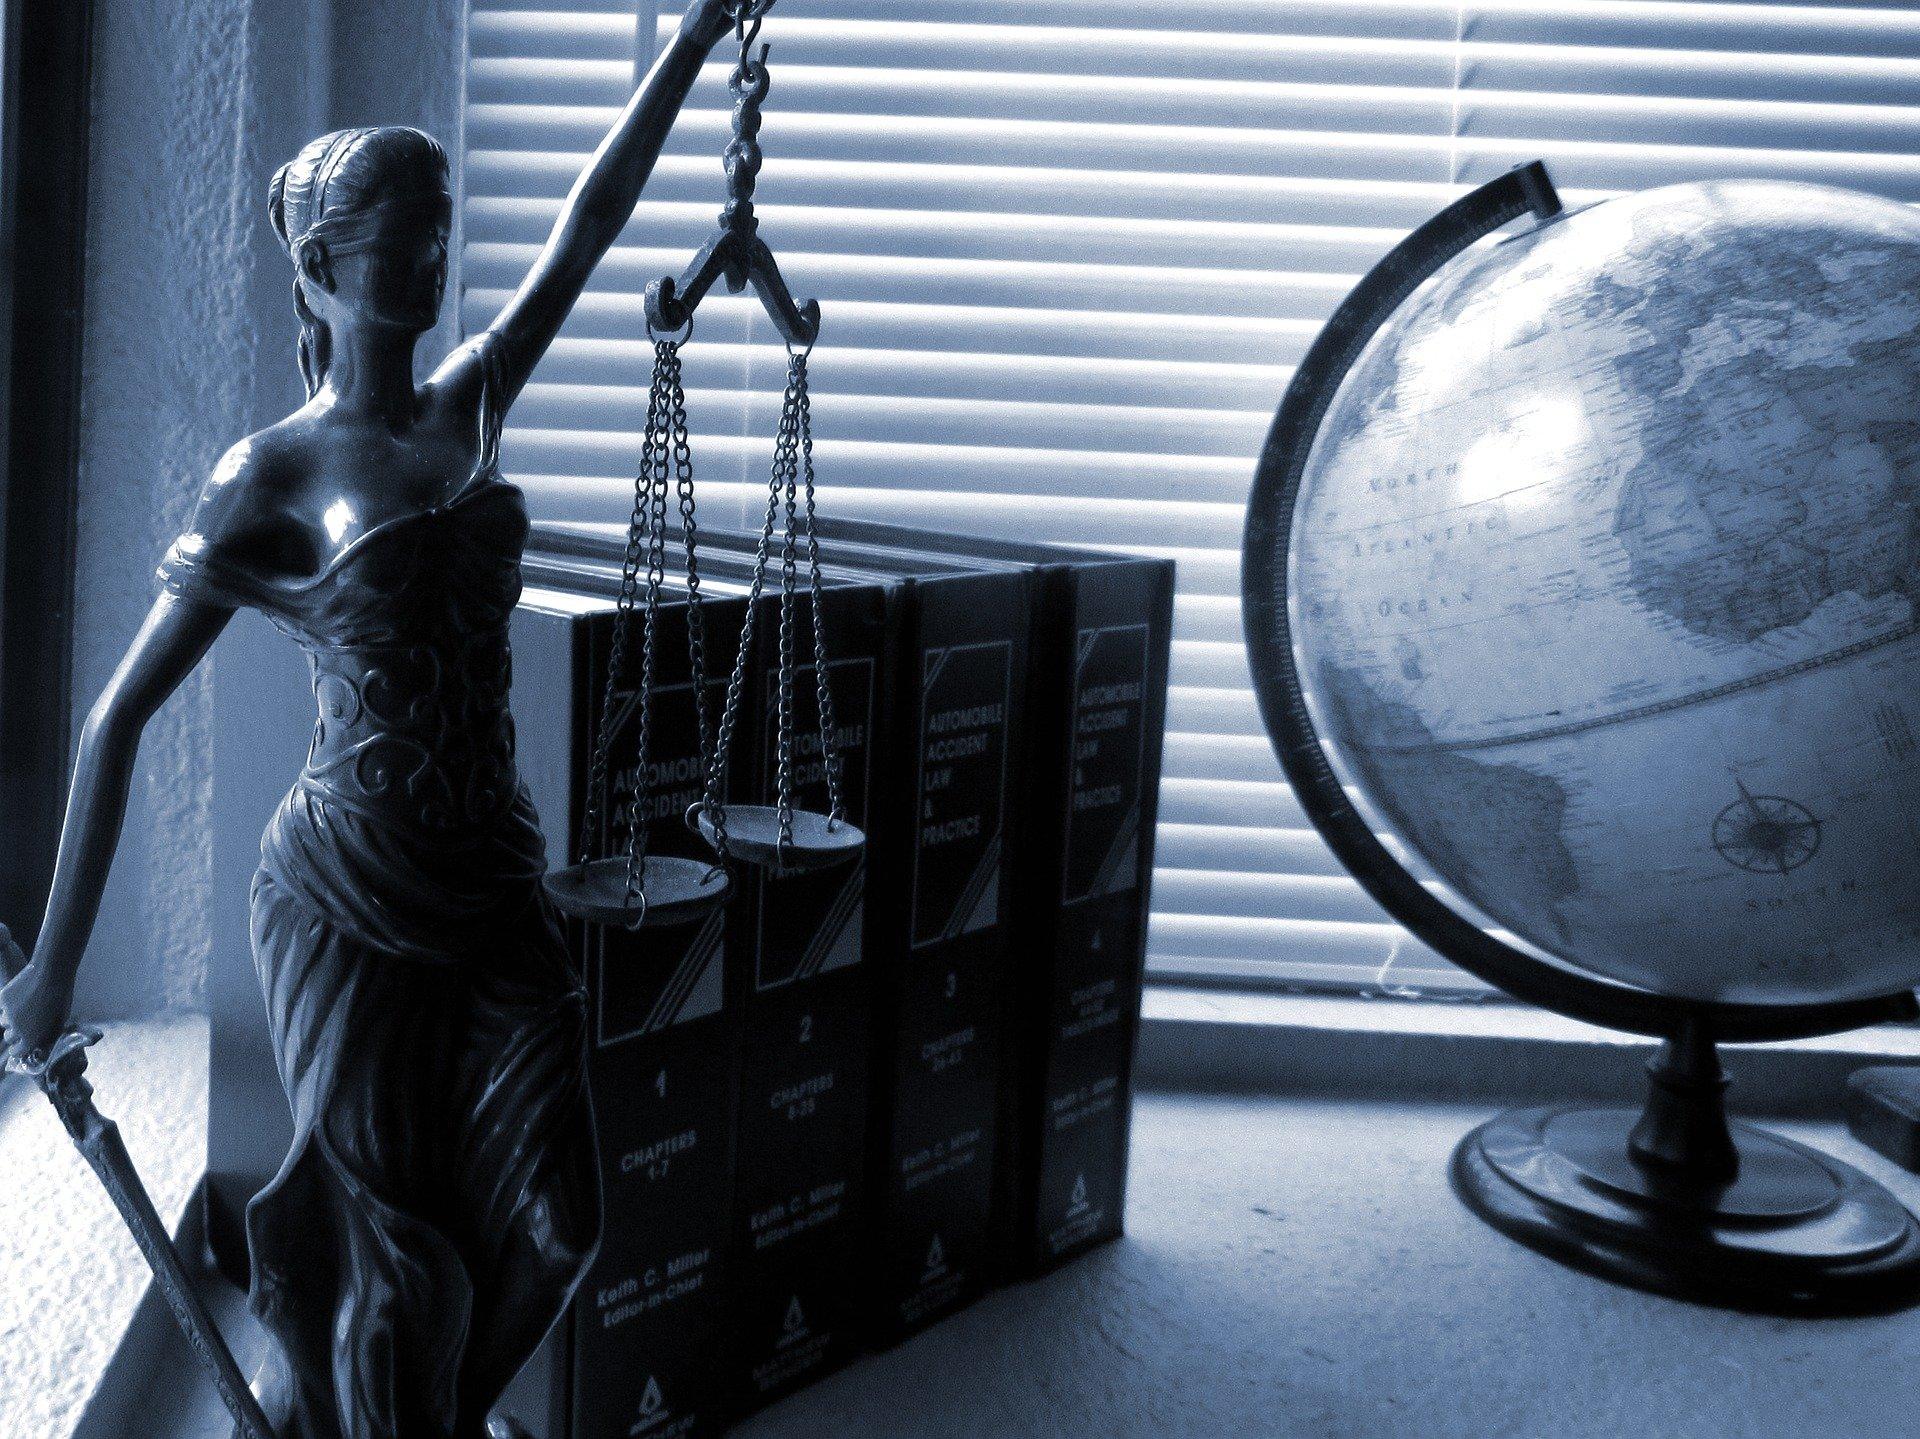 The Law Office of Jeremy Gordon, Criminal Defense Attorneys